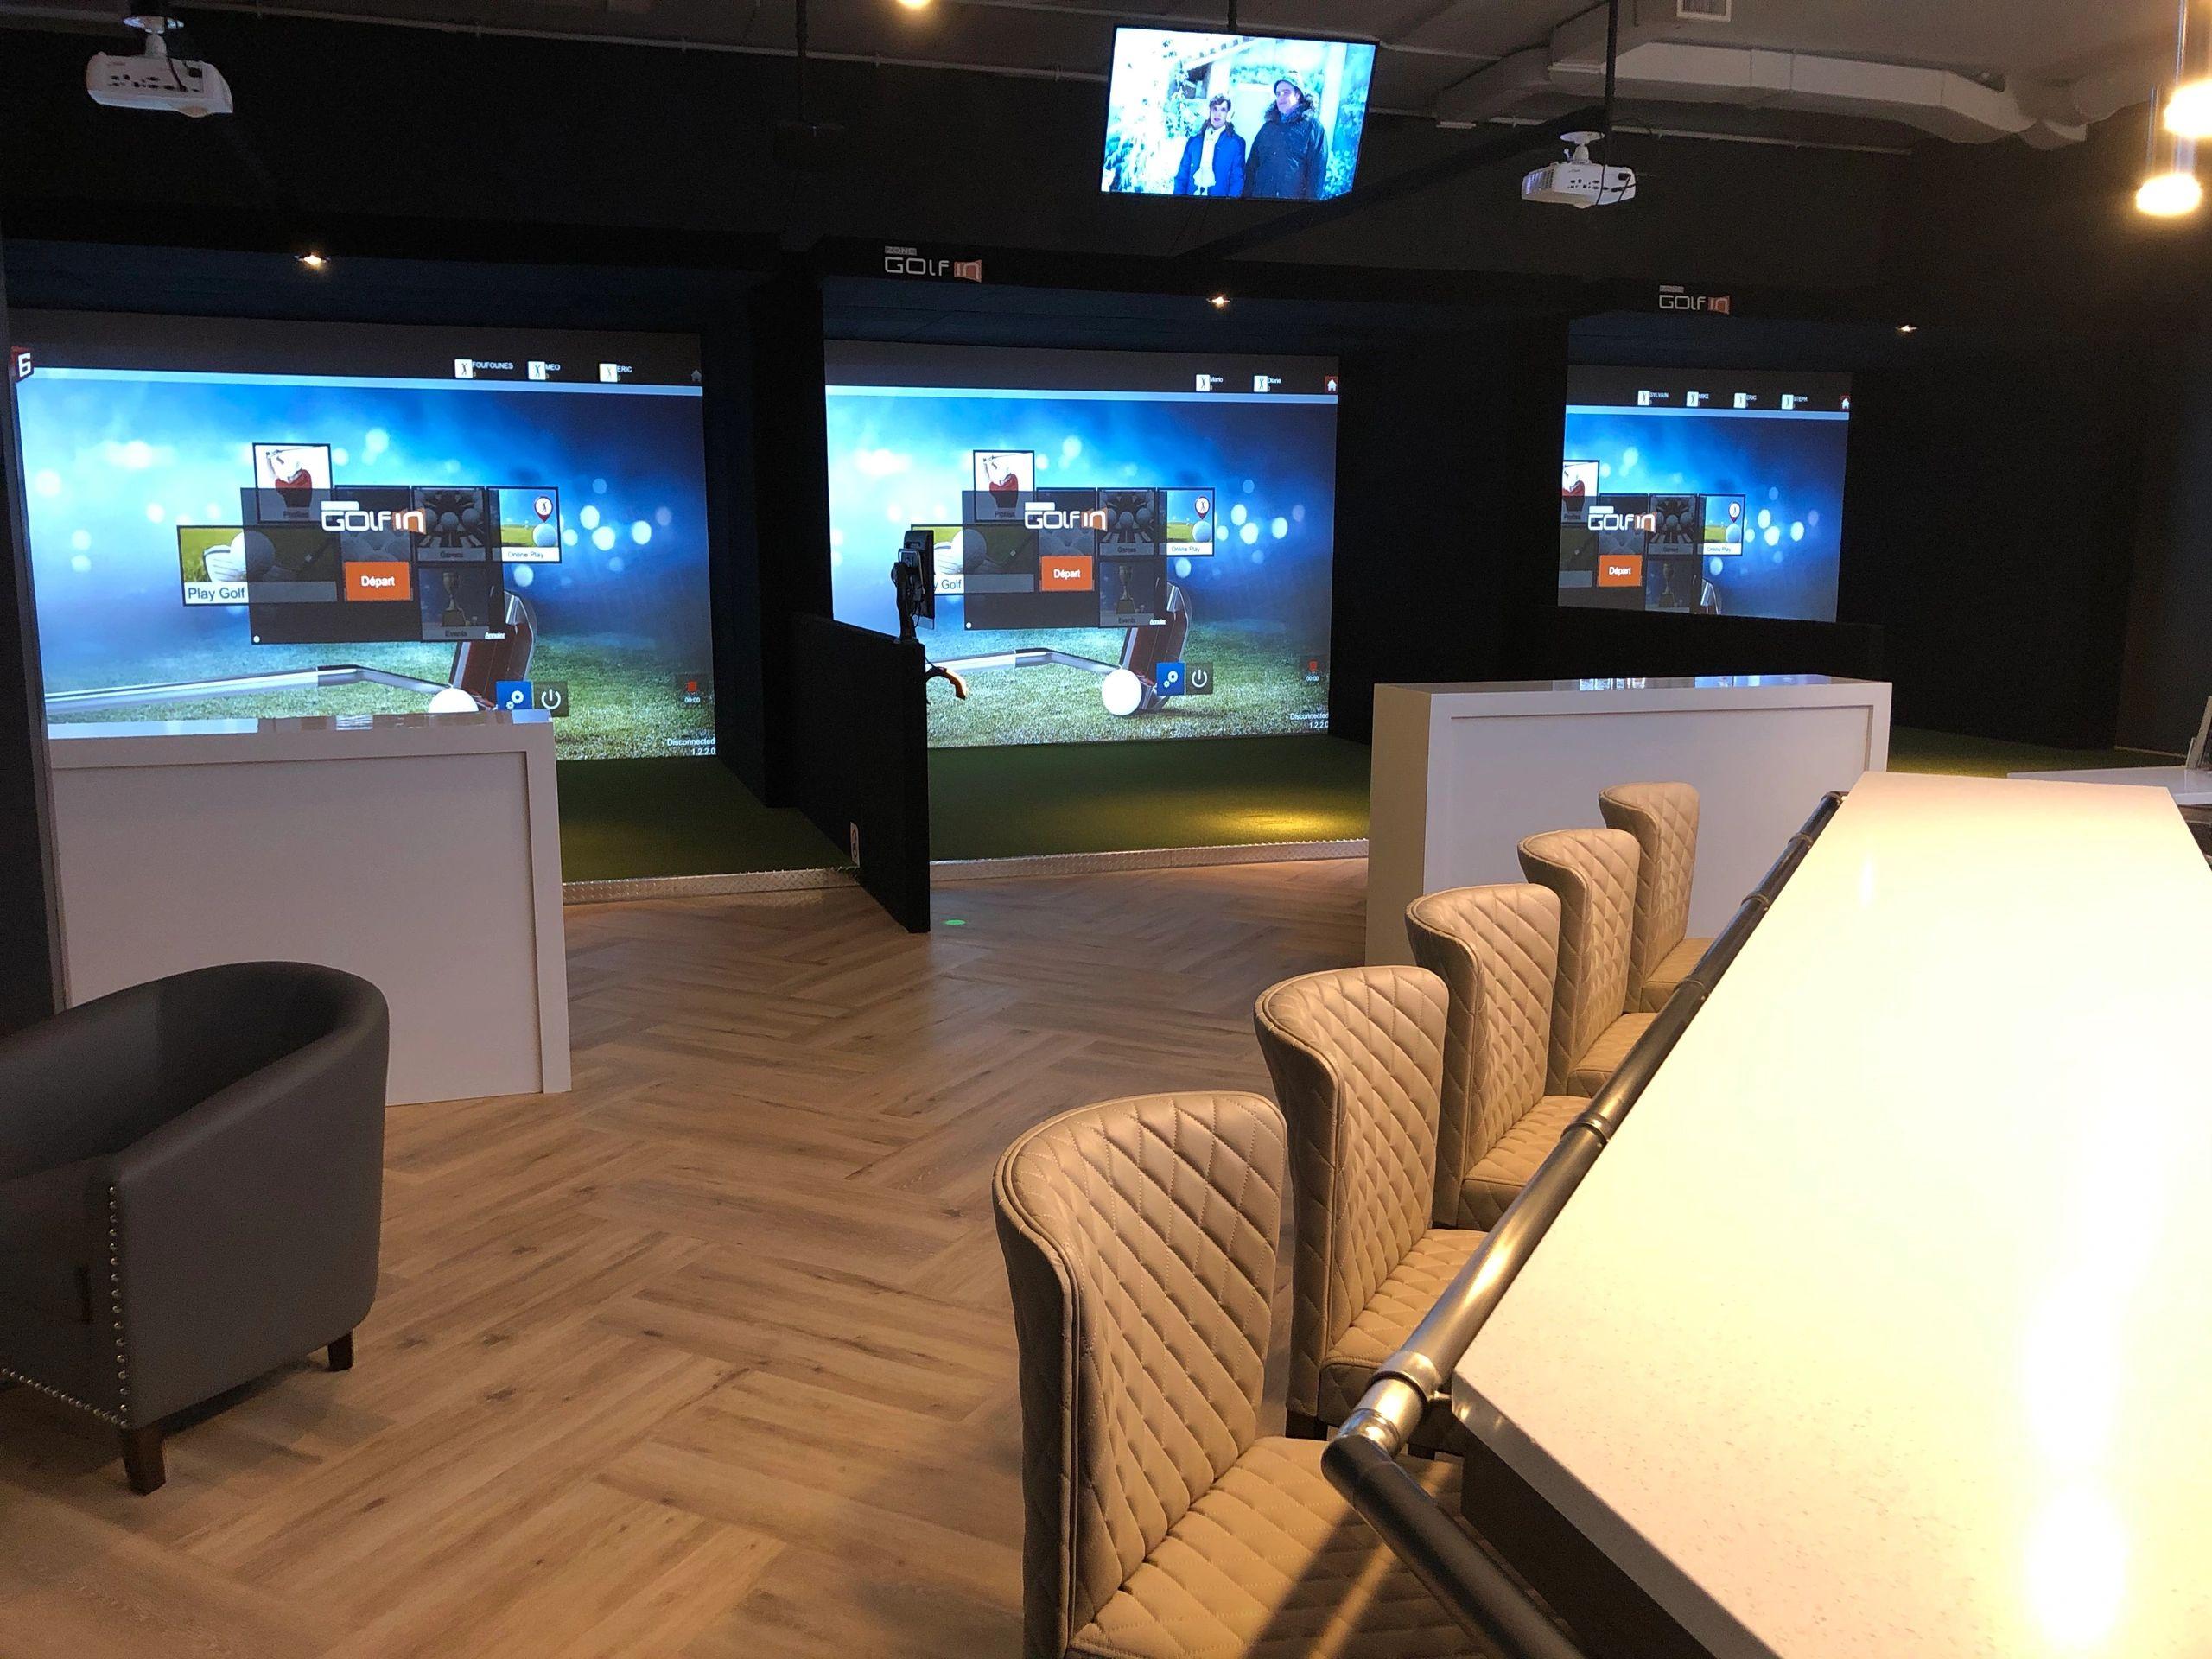 Zone Golf In Sherbrooke : simulateur de golf intérieur à Sherbrooke